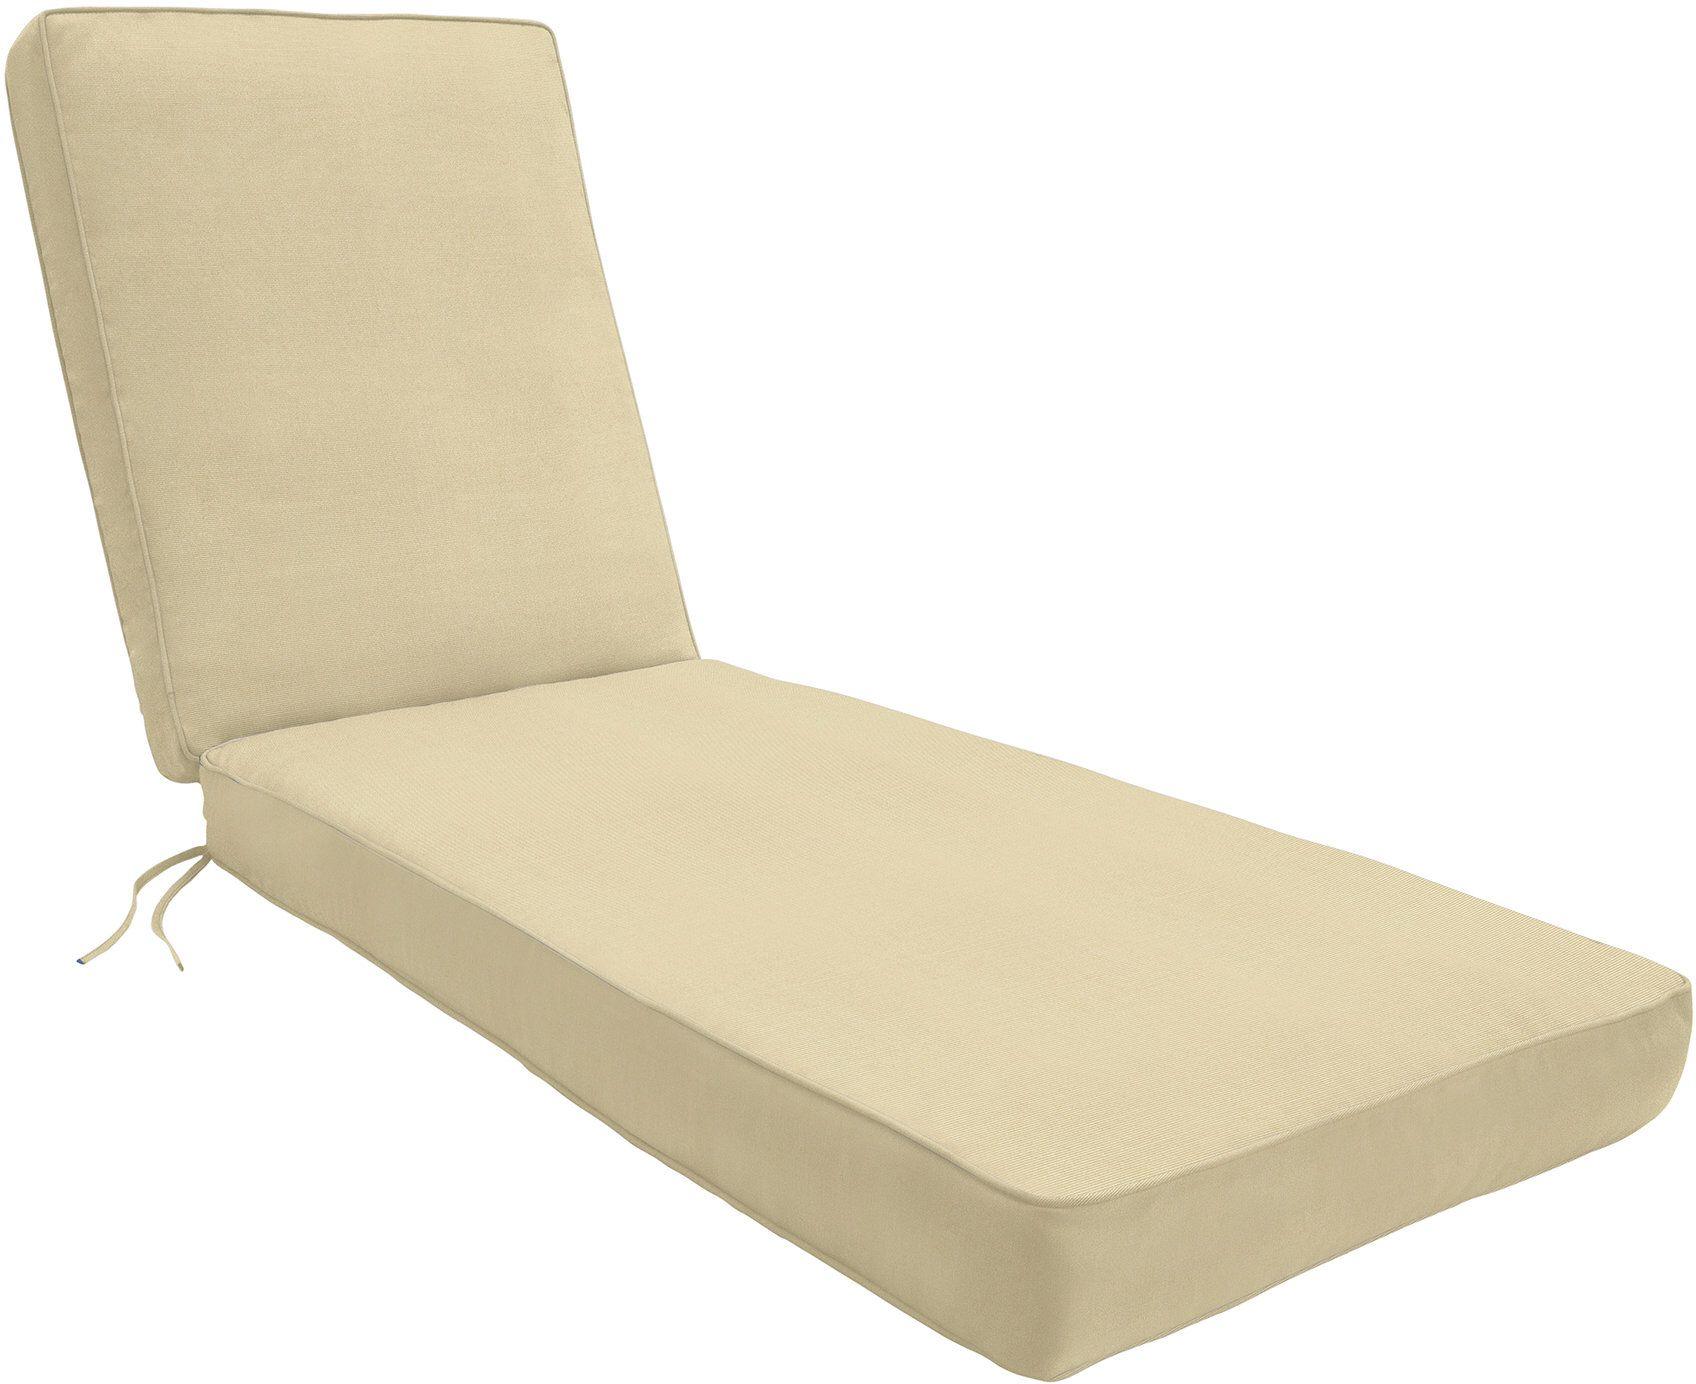 Indoor Outdoor Sunbrella Chaise Lounge Cushion Custom Outdoor